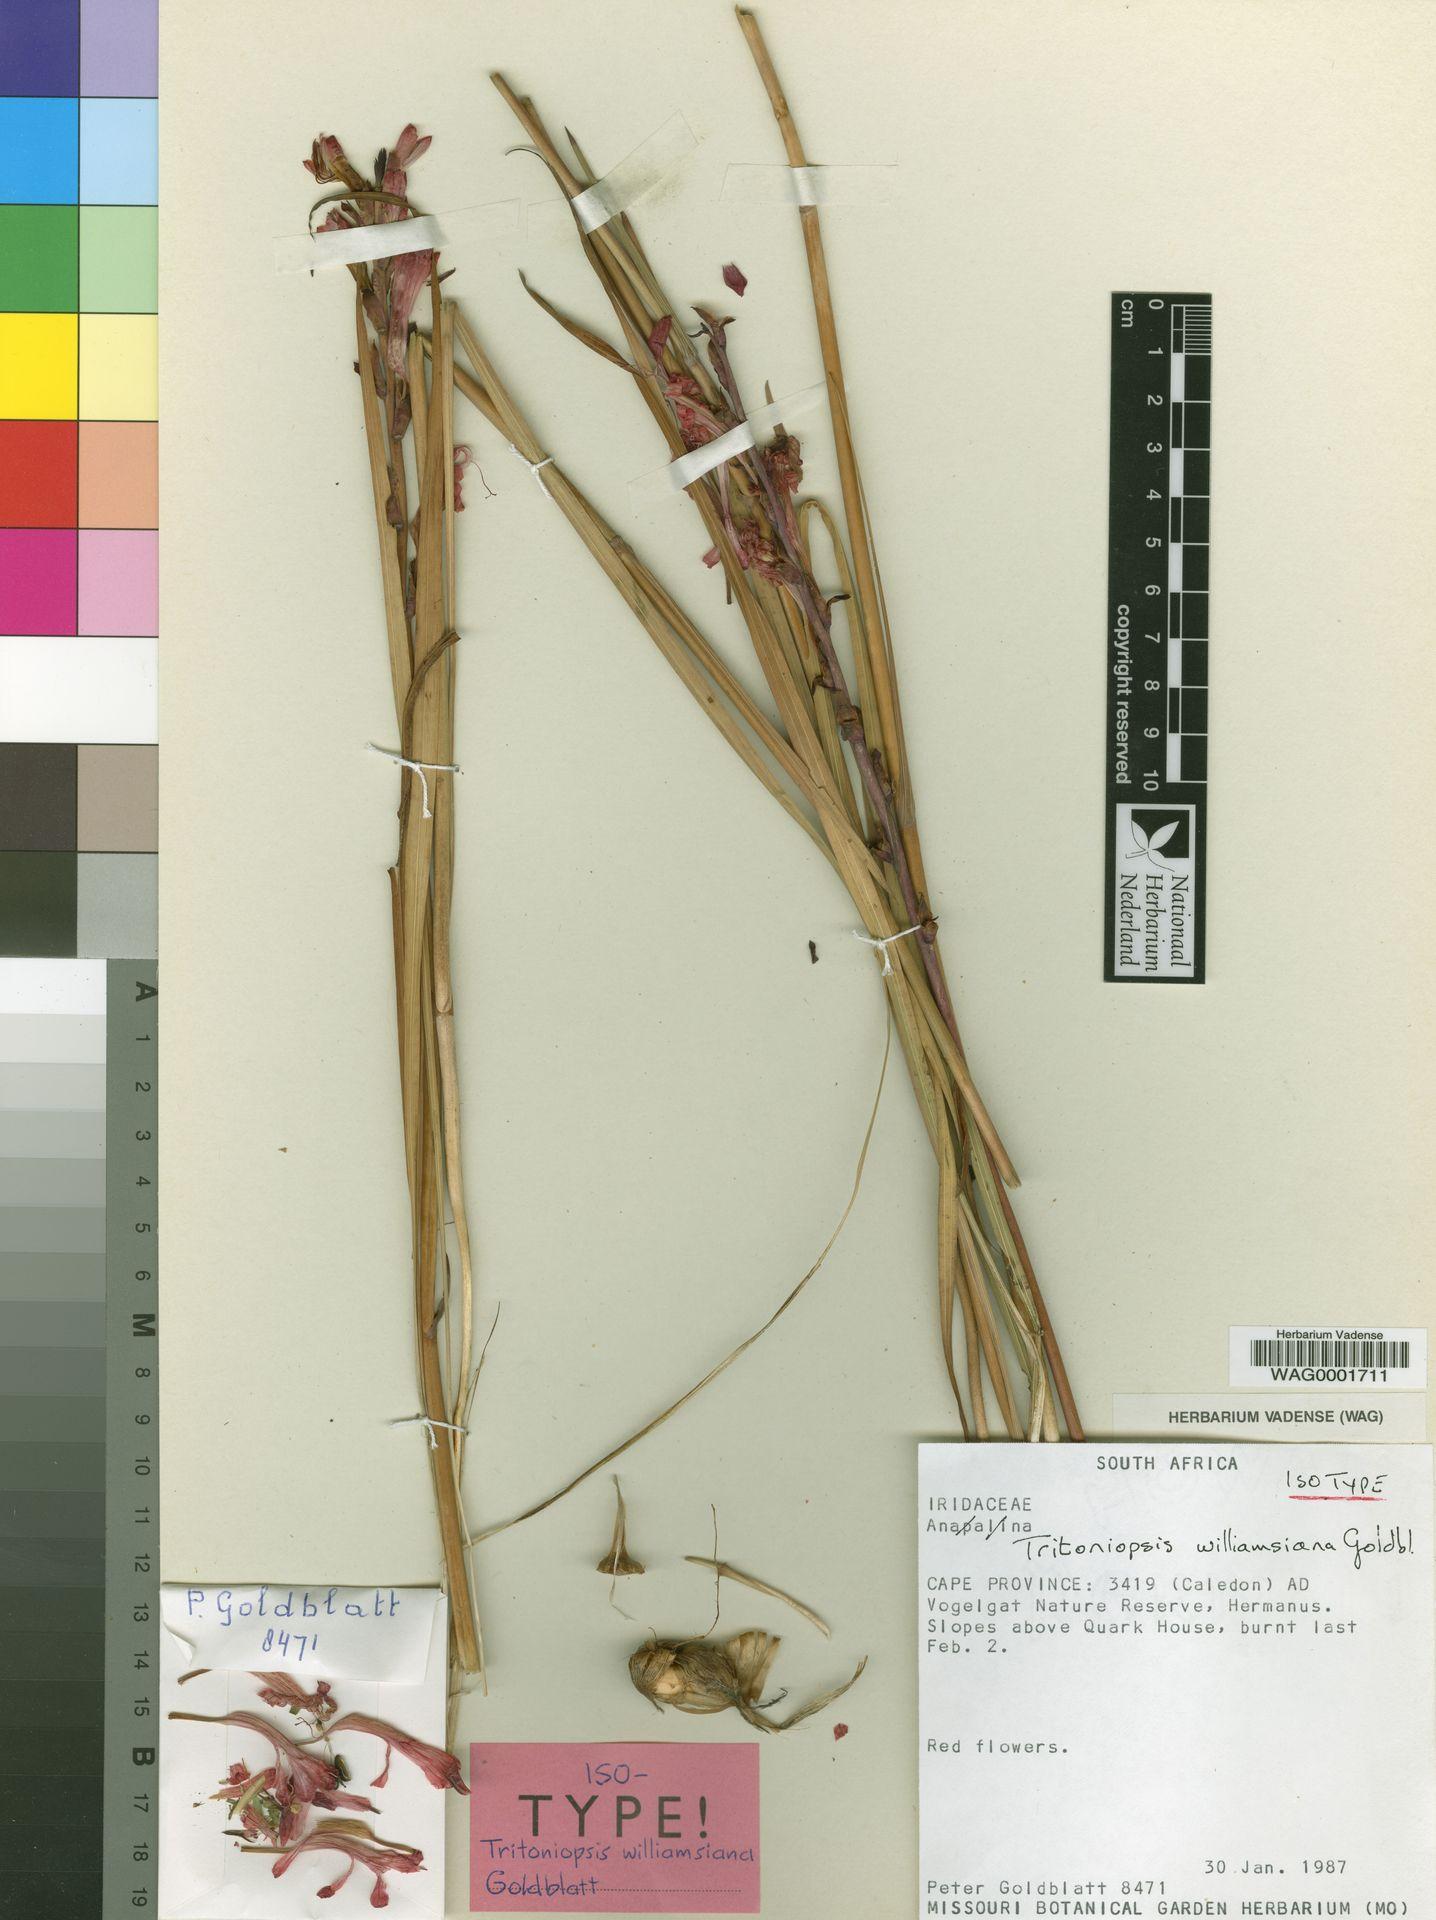 WAG0001711 | Tritoniopsis williamsiana Goldblatt